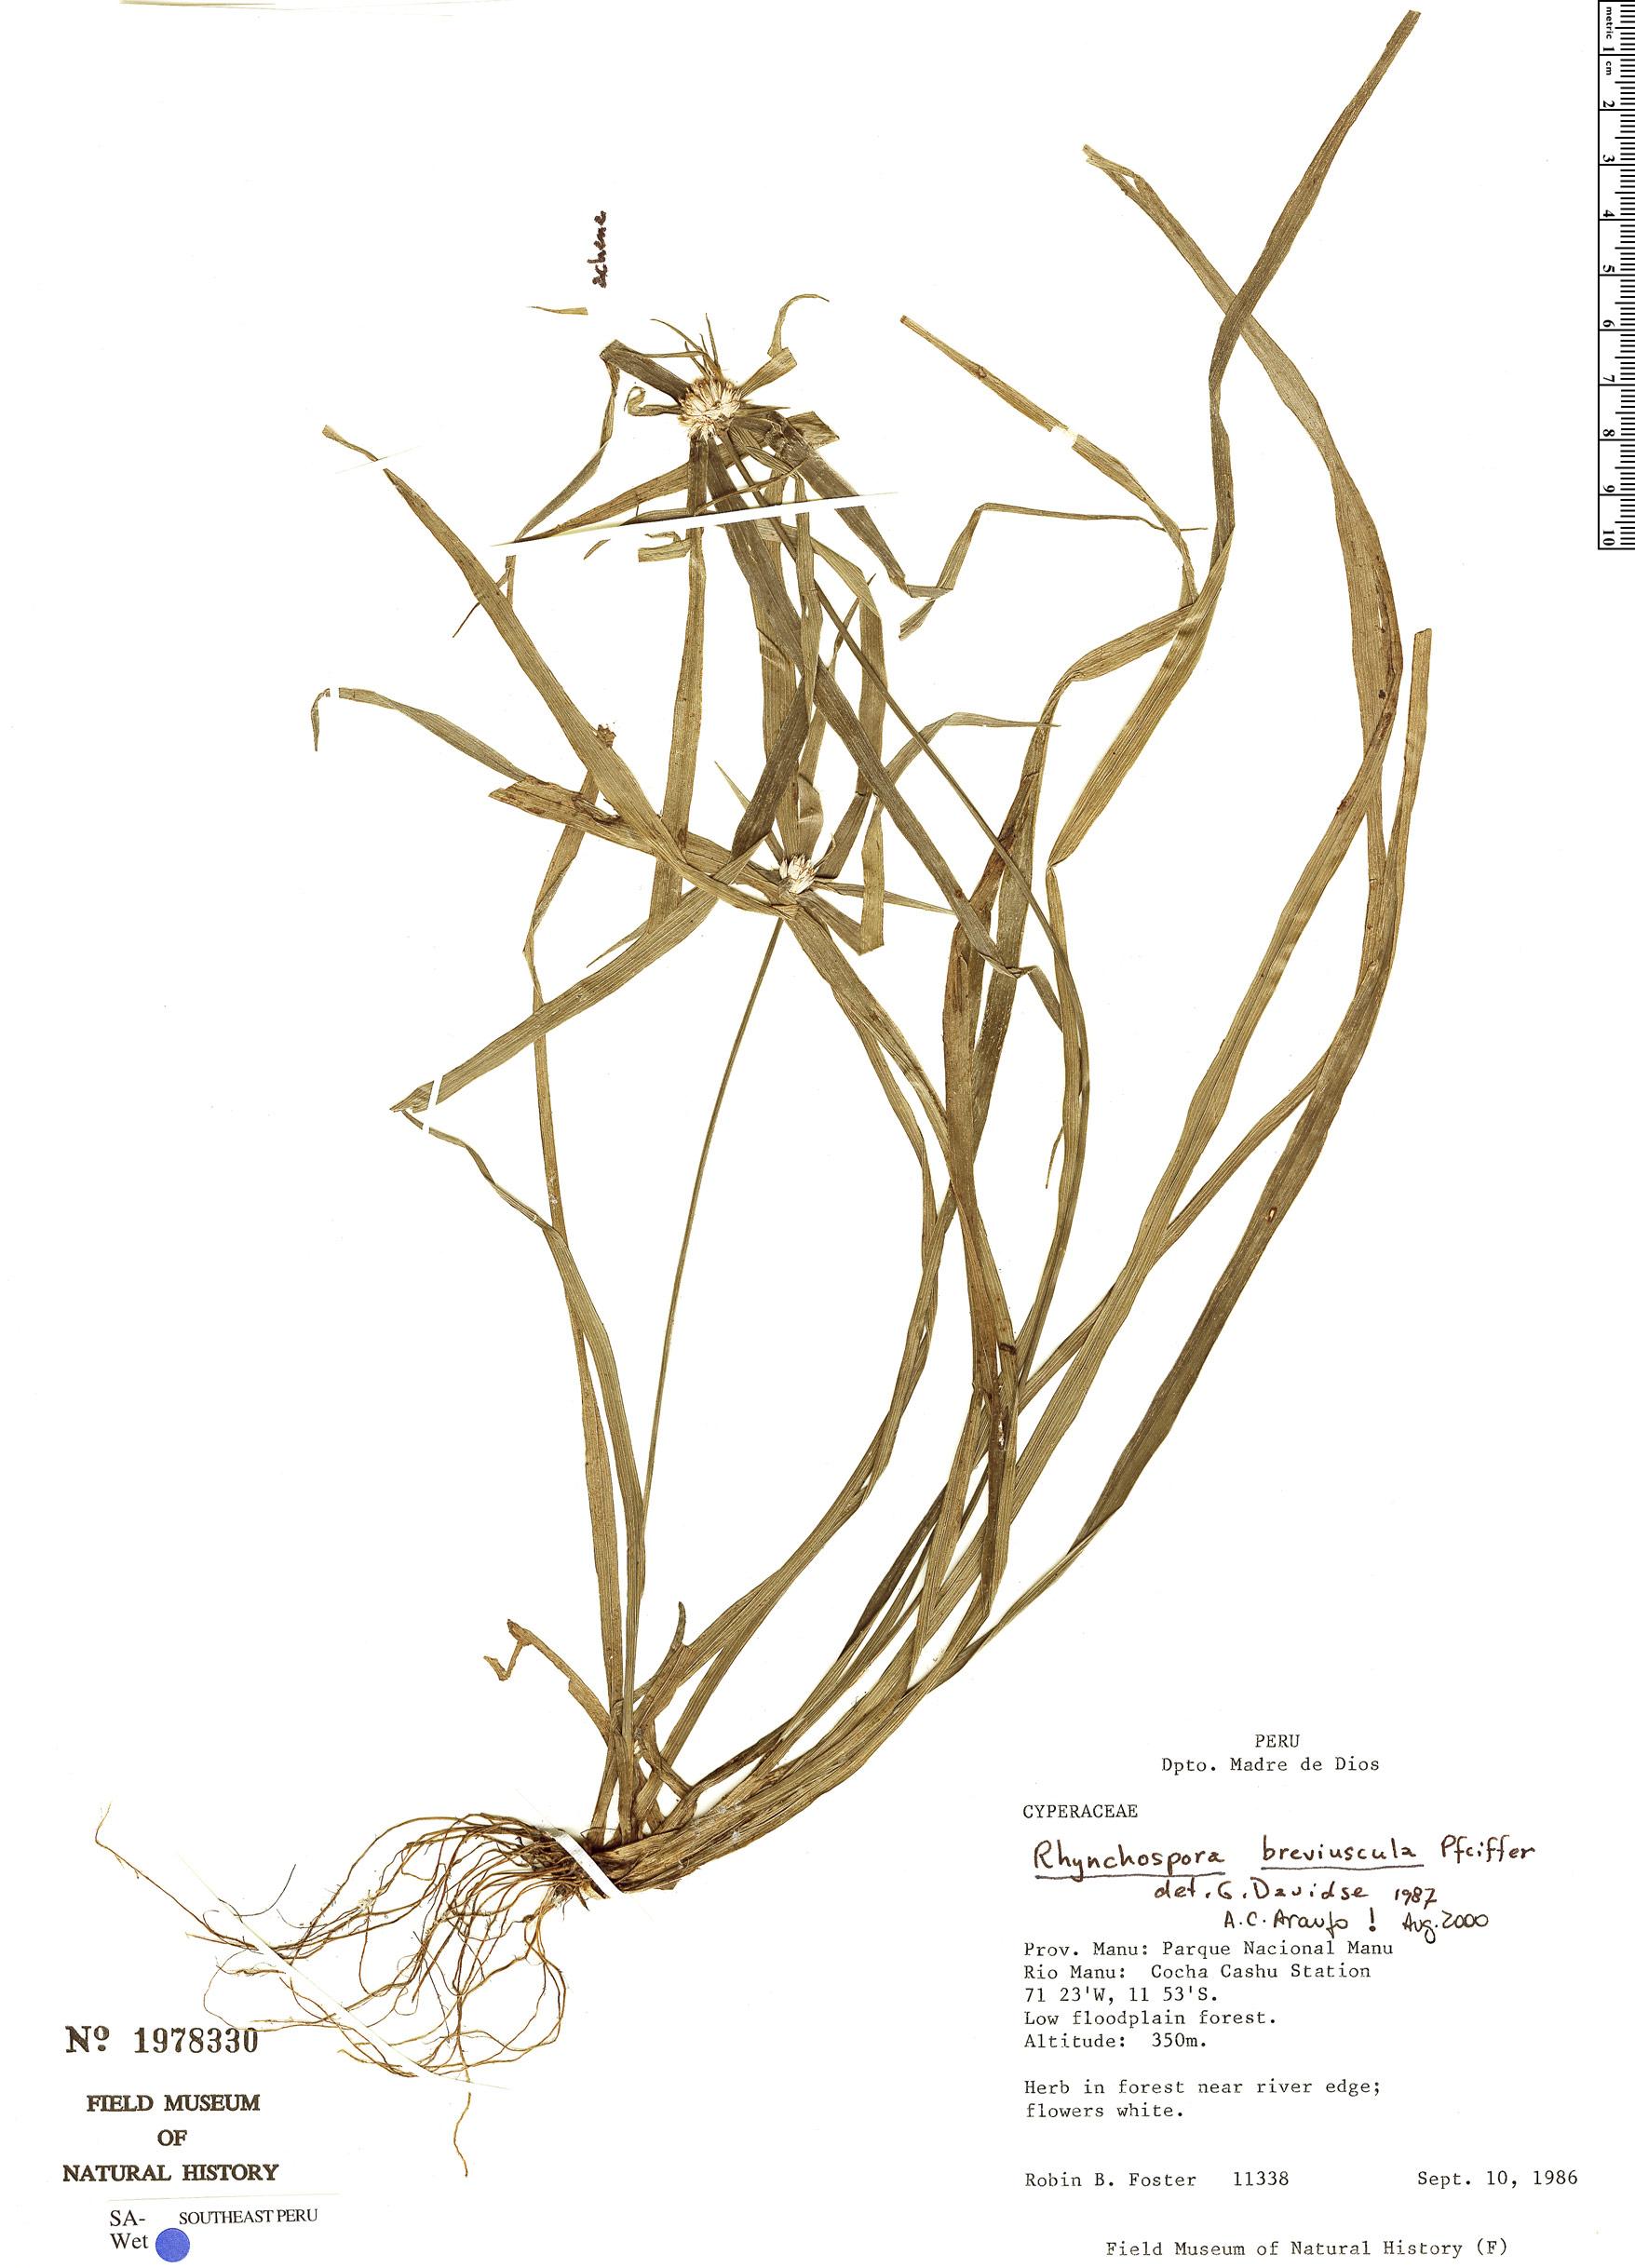 Specimen: Rhynchospora breviuscula